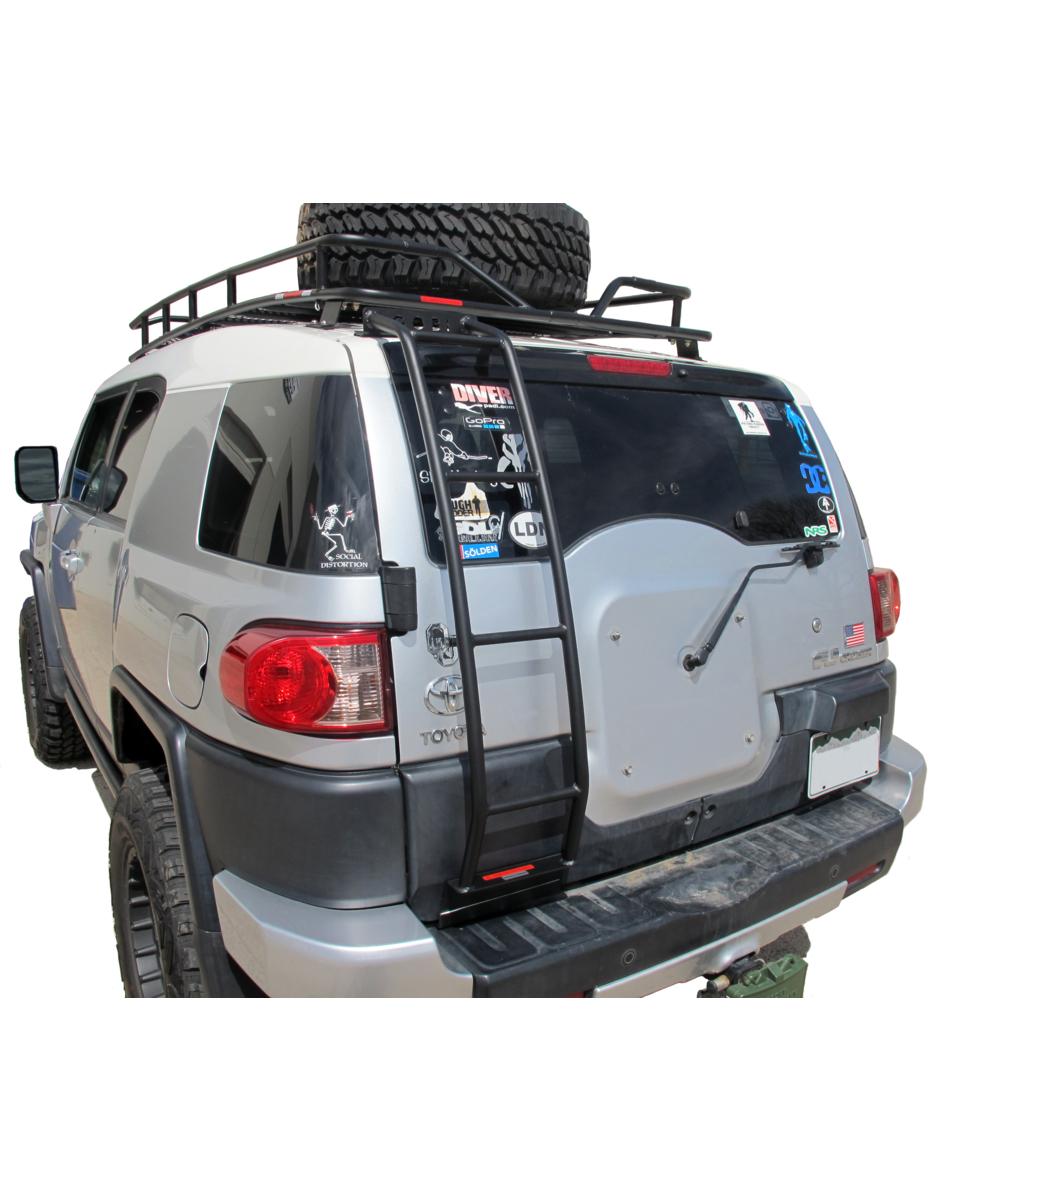 Gobi Toyota Fj Cruiser Rear Ladder No Spare Tire Driver Side